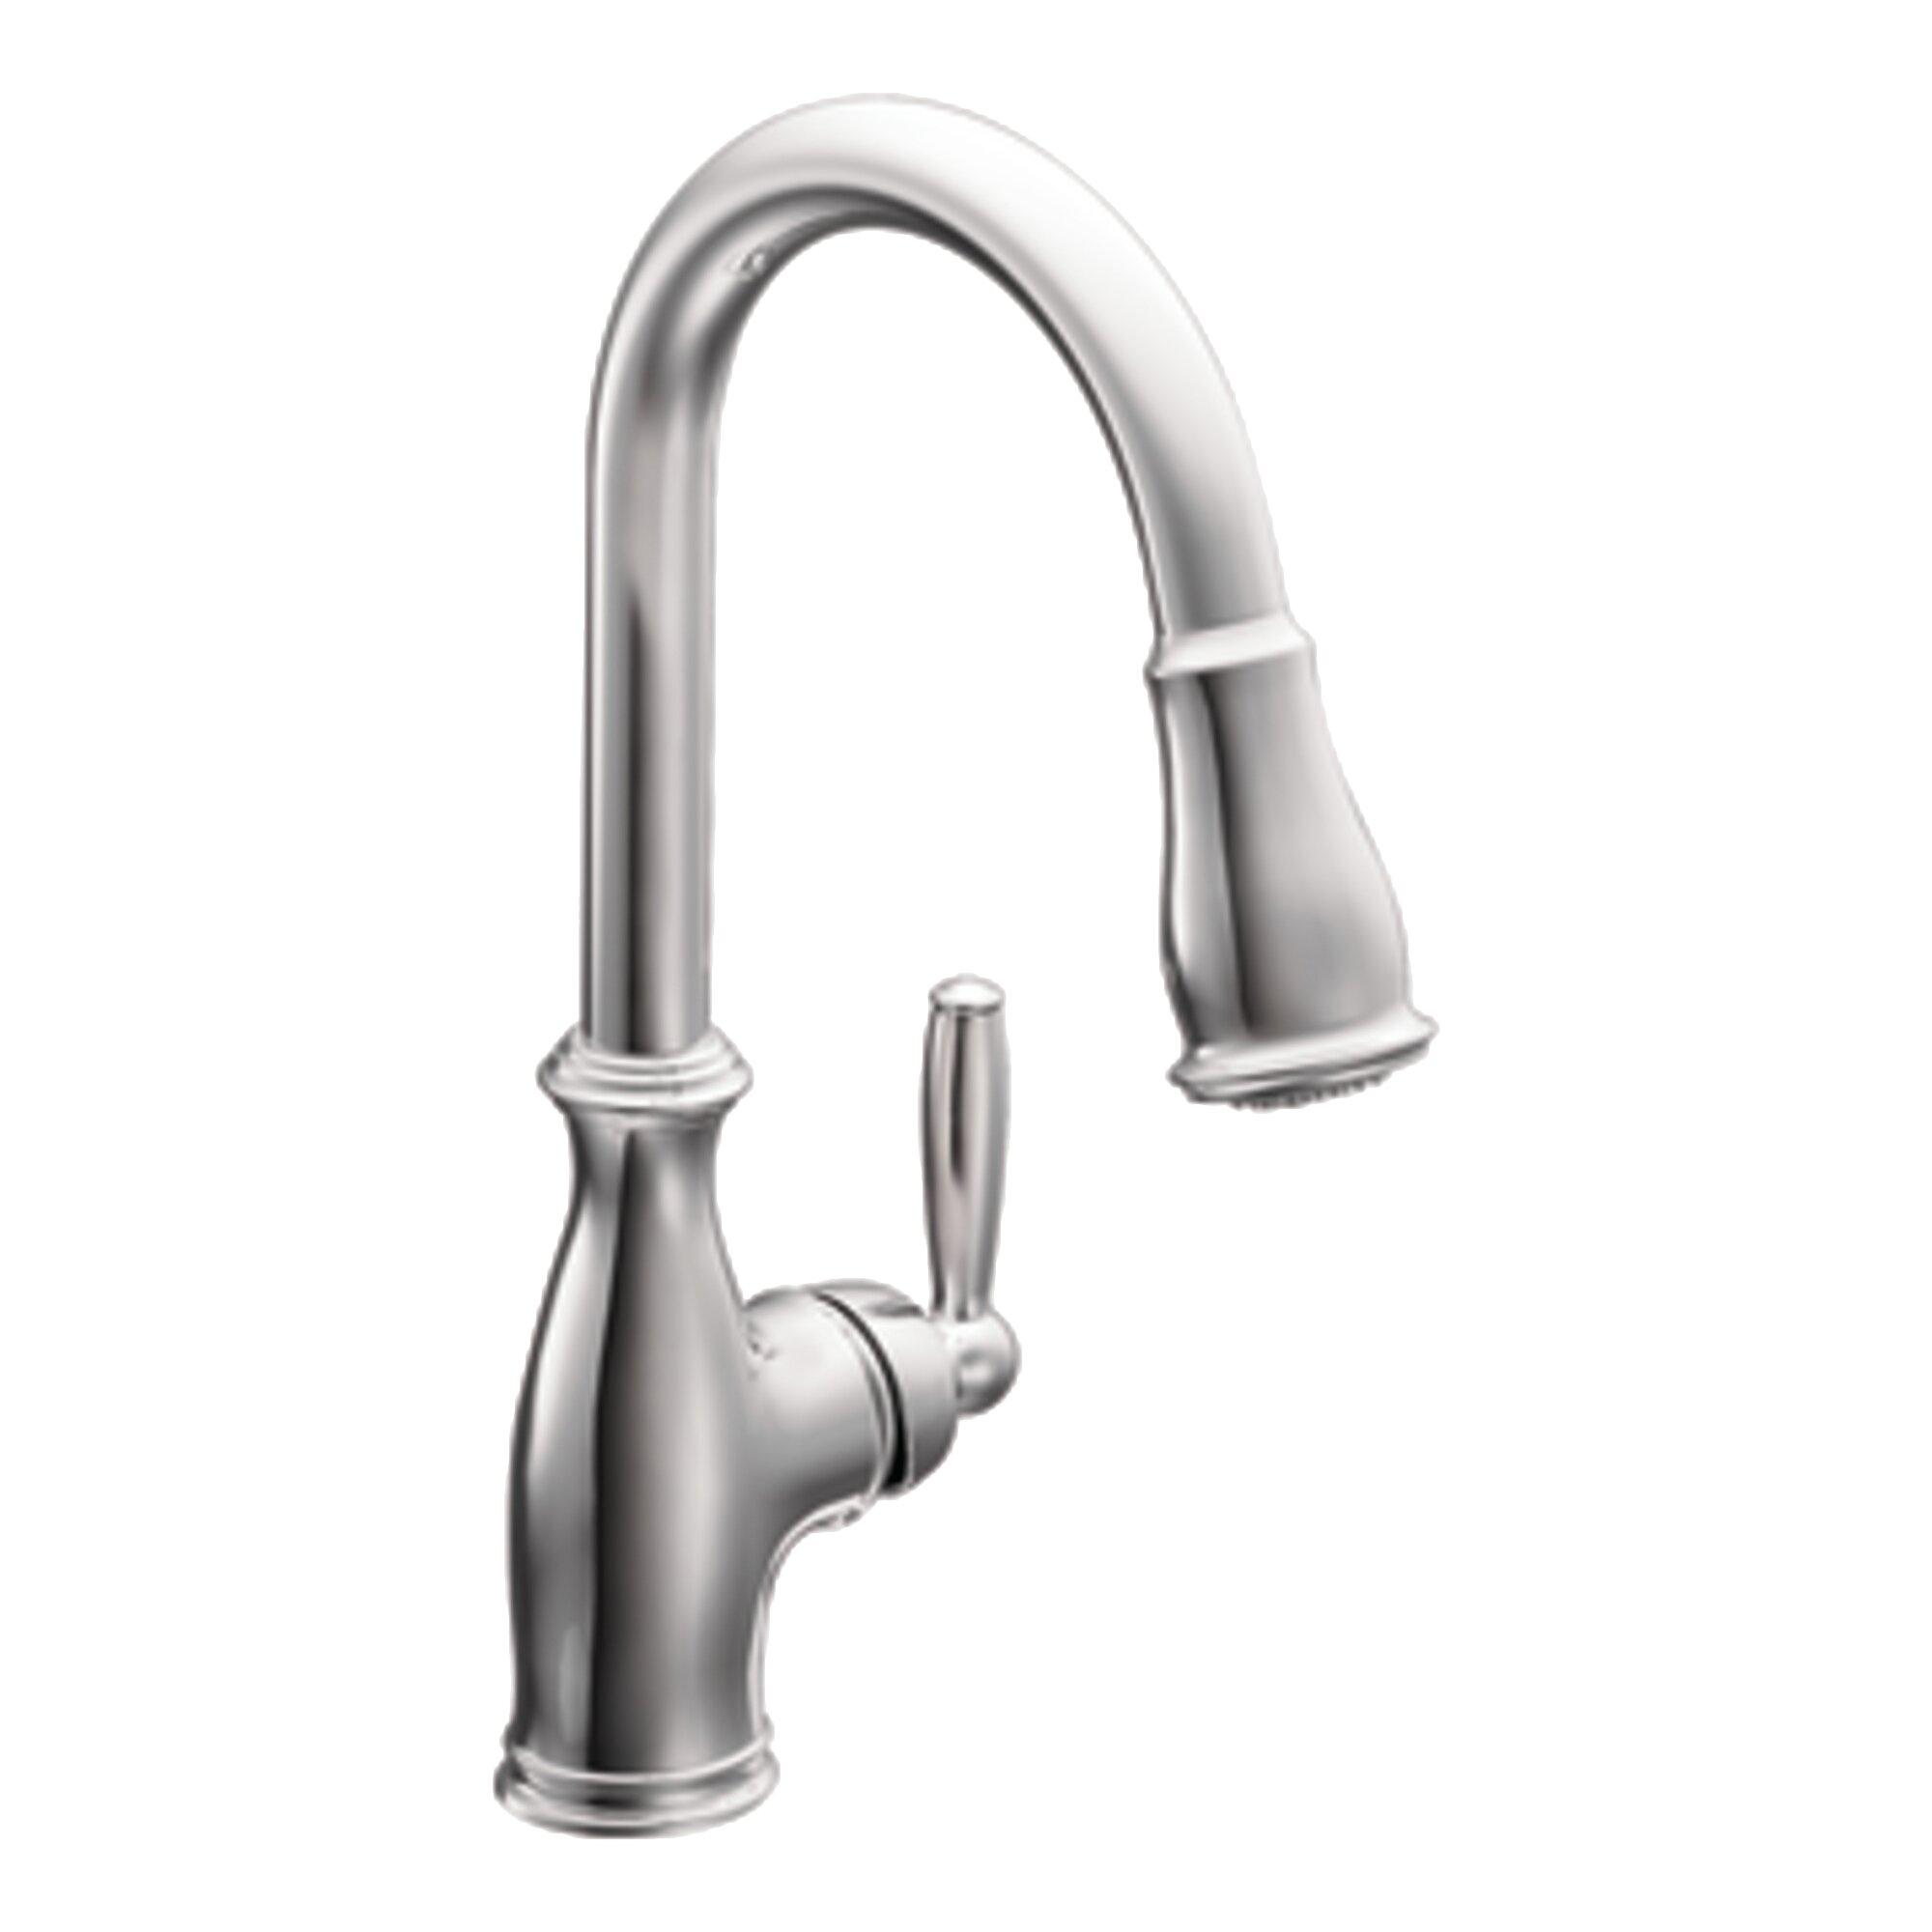 brantford single handle kitchen faucet wayfair 7295c moen brantford series one handle pullout chrome